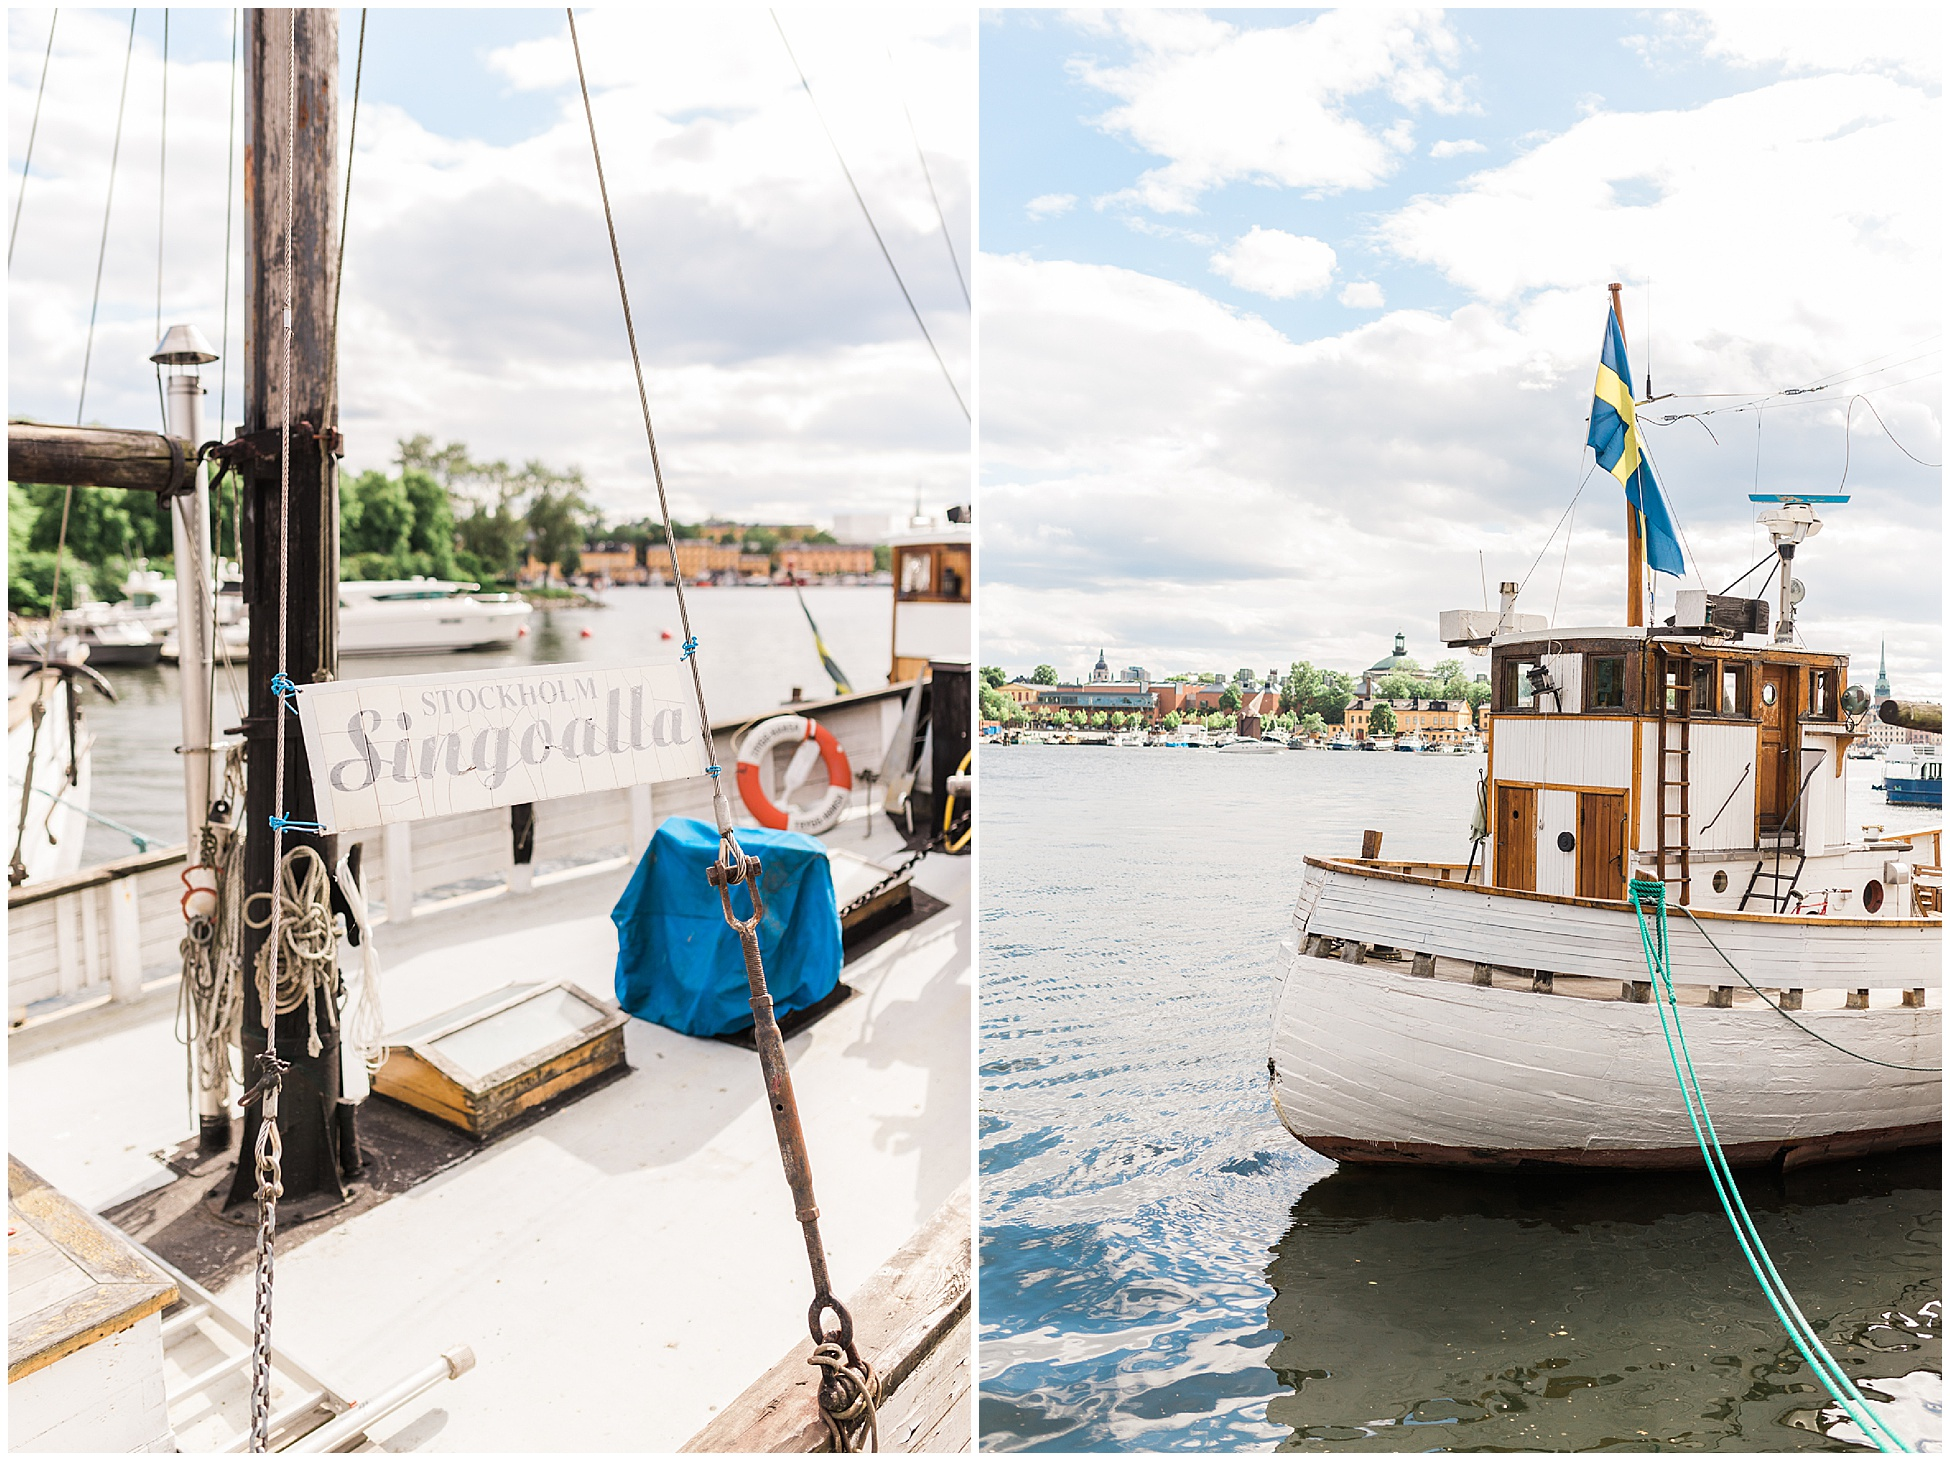 stockholm-044.jpg